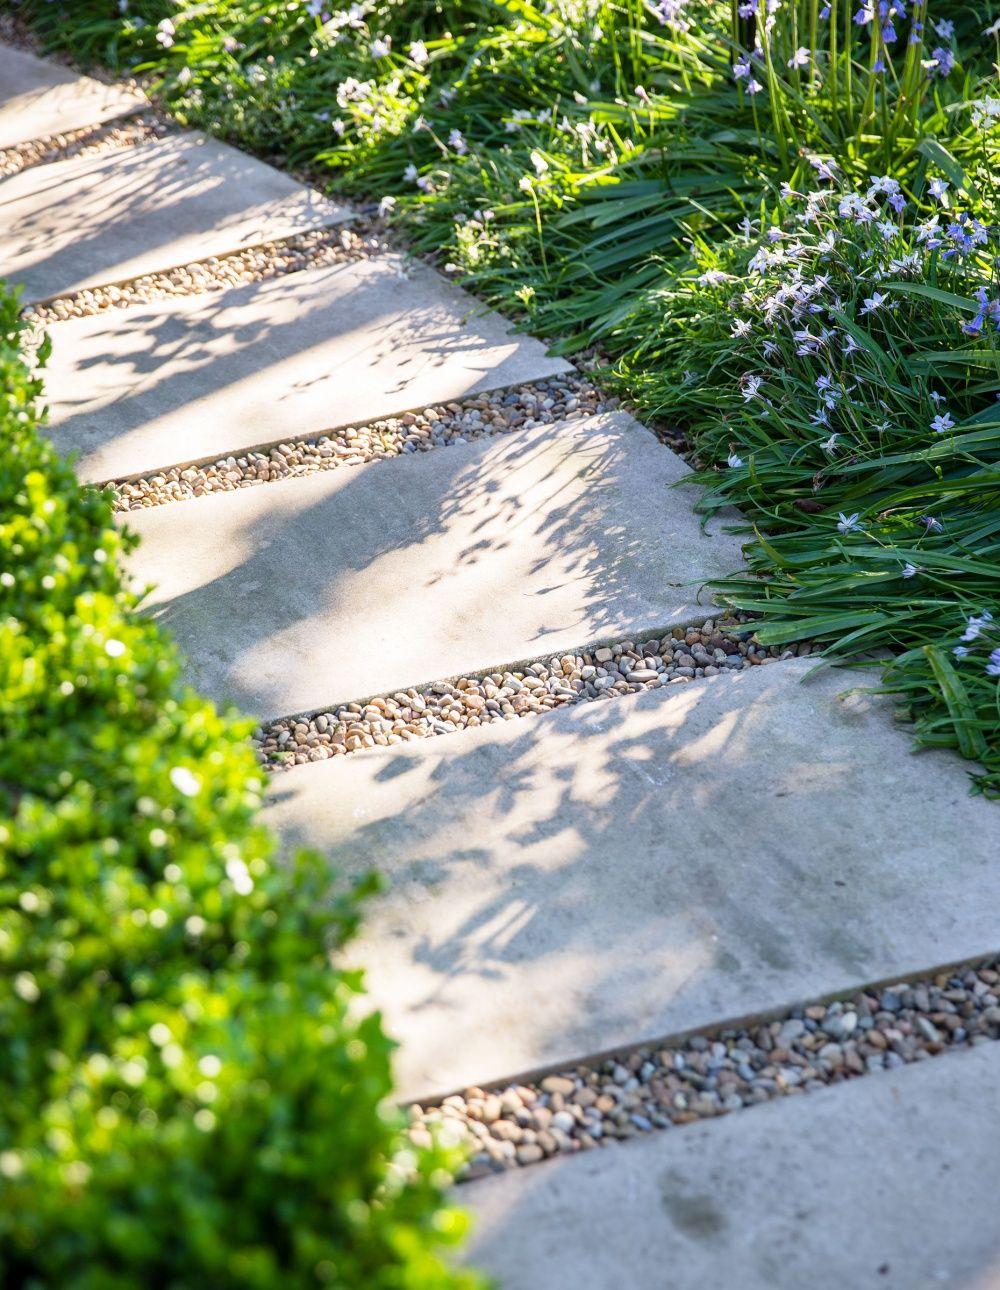 A Lush Heritage Garden in Sydney - The Design Files | Australia's most popular design blog.